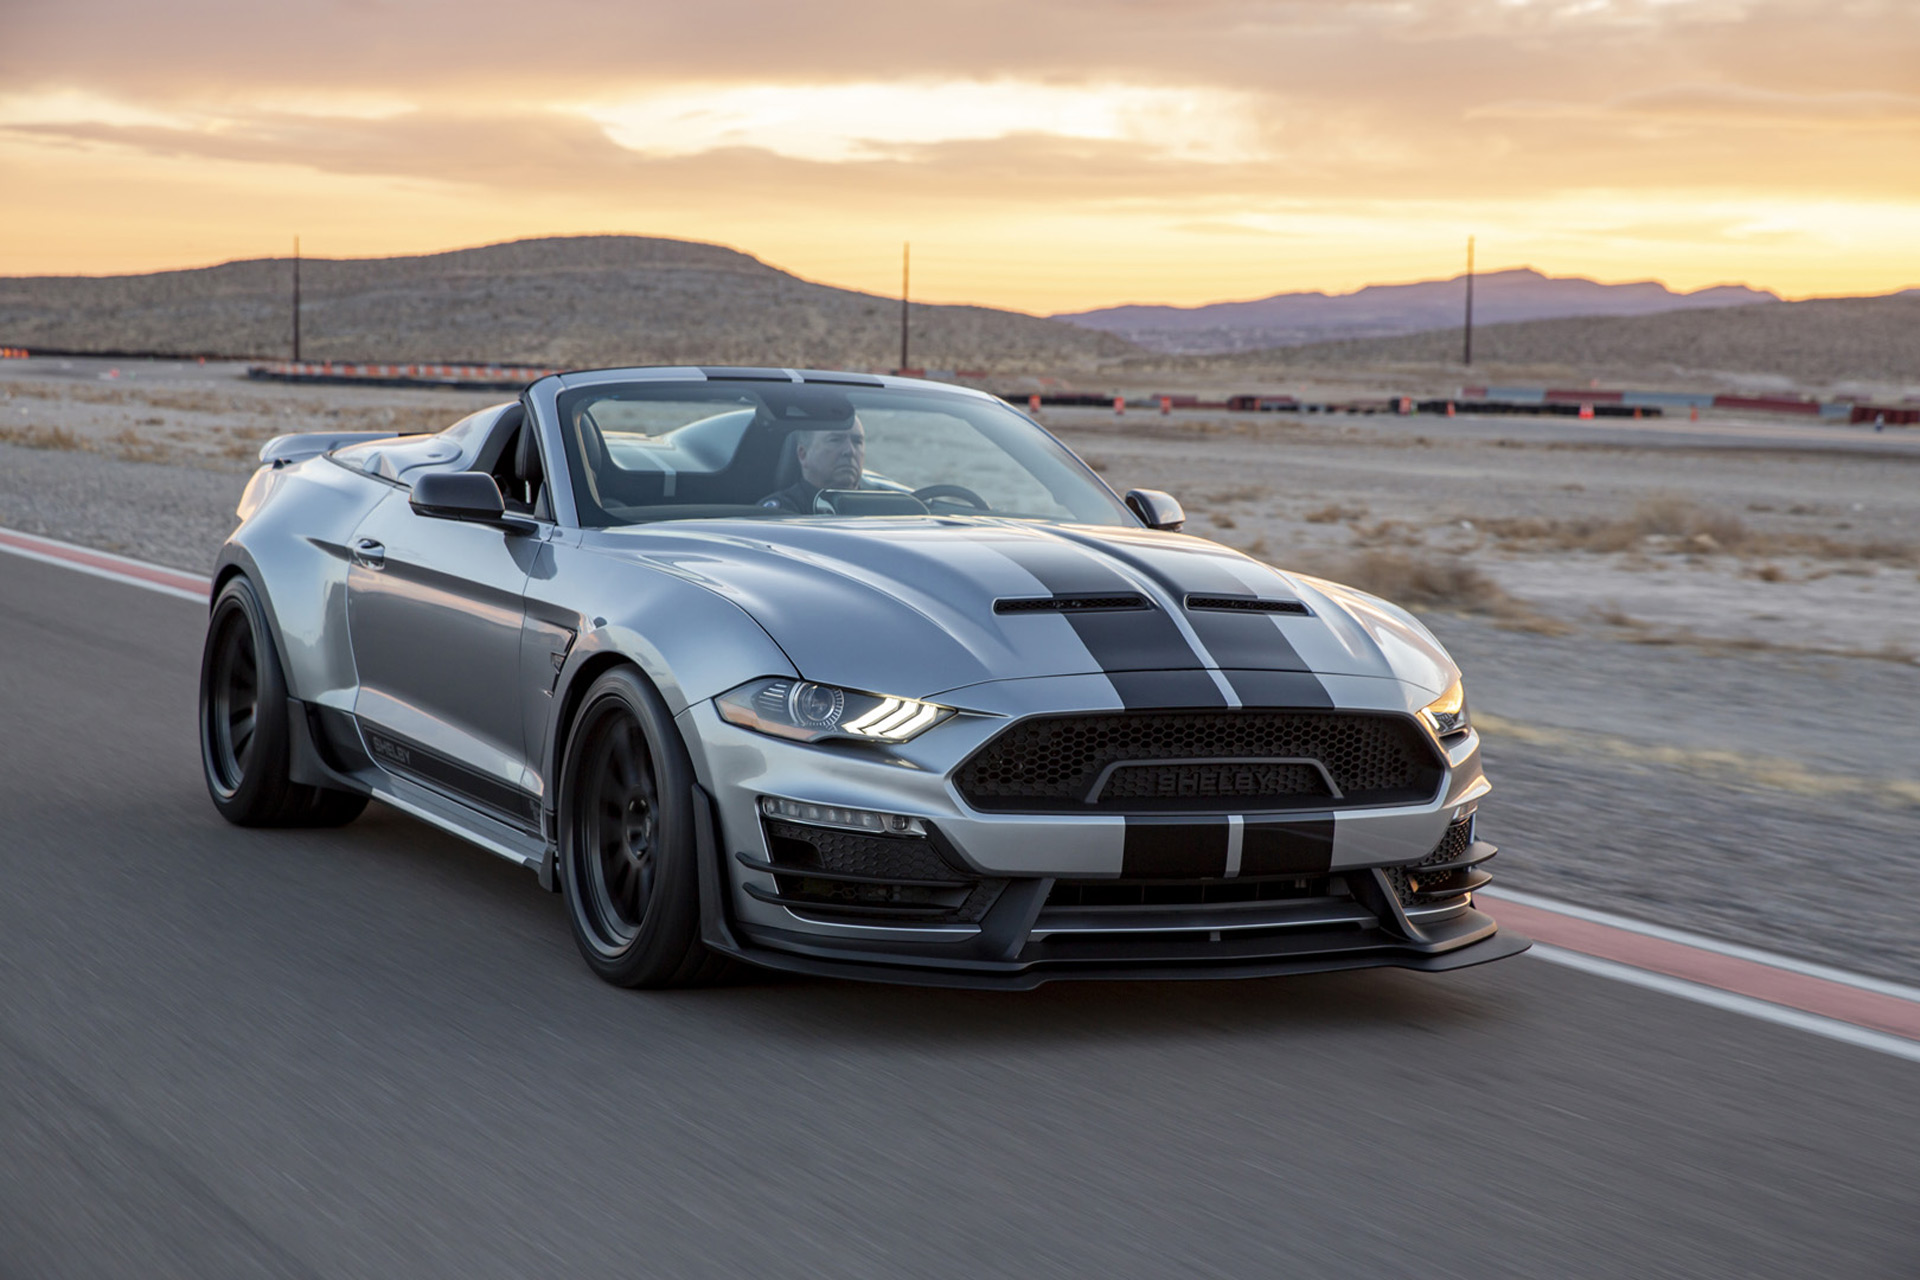 2021 Ford Shelby Super Snake spawns speedster body style